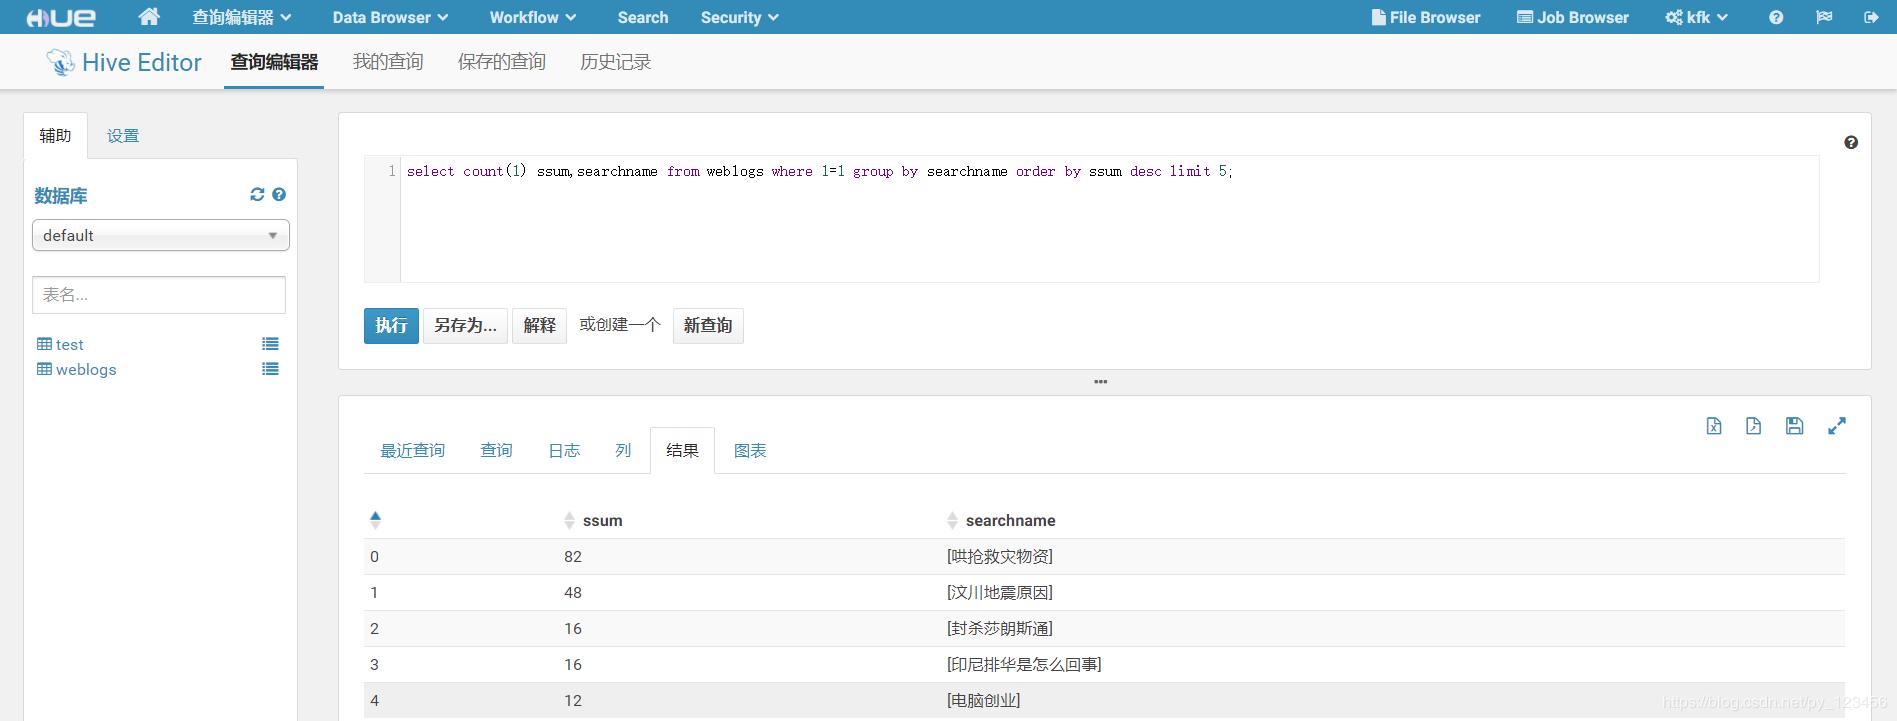 Cloudera HUE big data visualization analysis - Programmer Sought